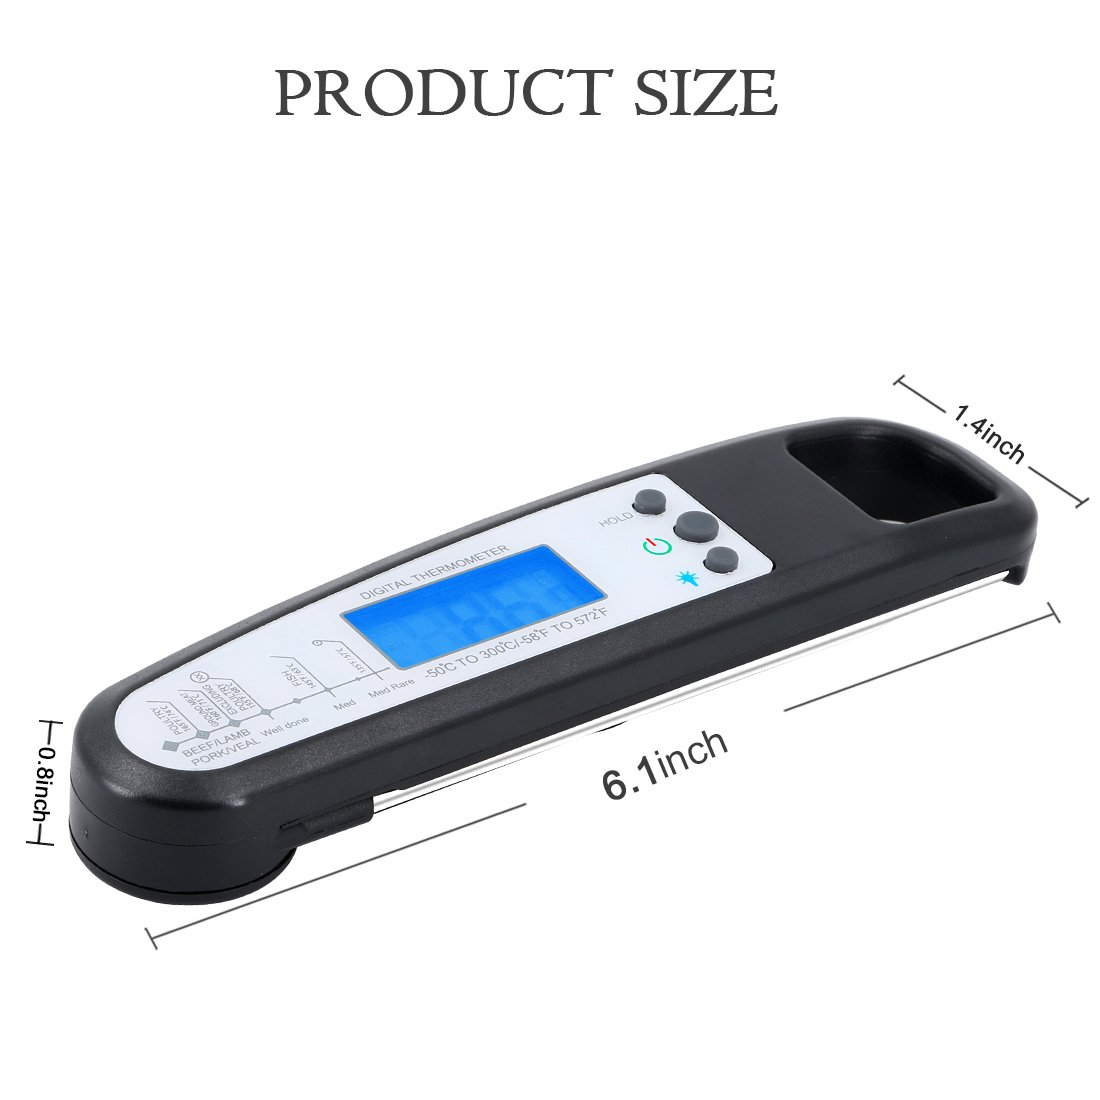 Termómetro de cocina USCVIS Digital inalámbrico de humo de carne termómetro de carne Termómetro de comida instantánea exacta para el azúcar Jam de agua de ...